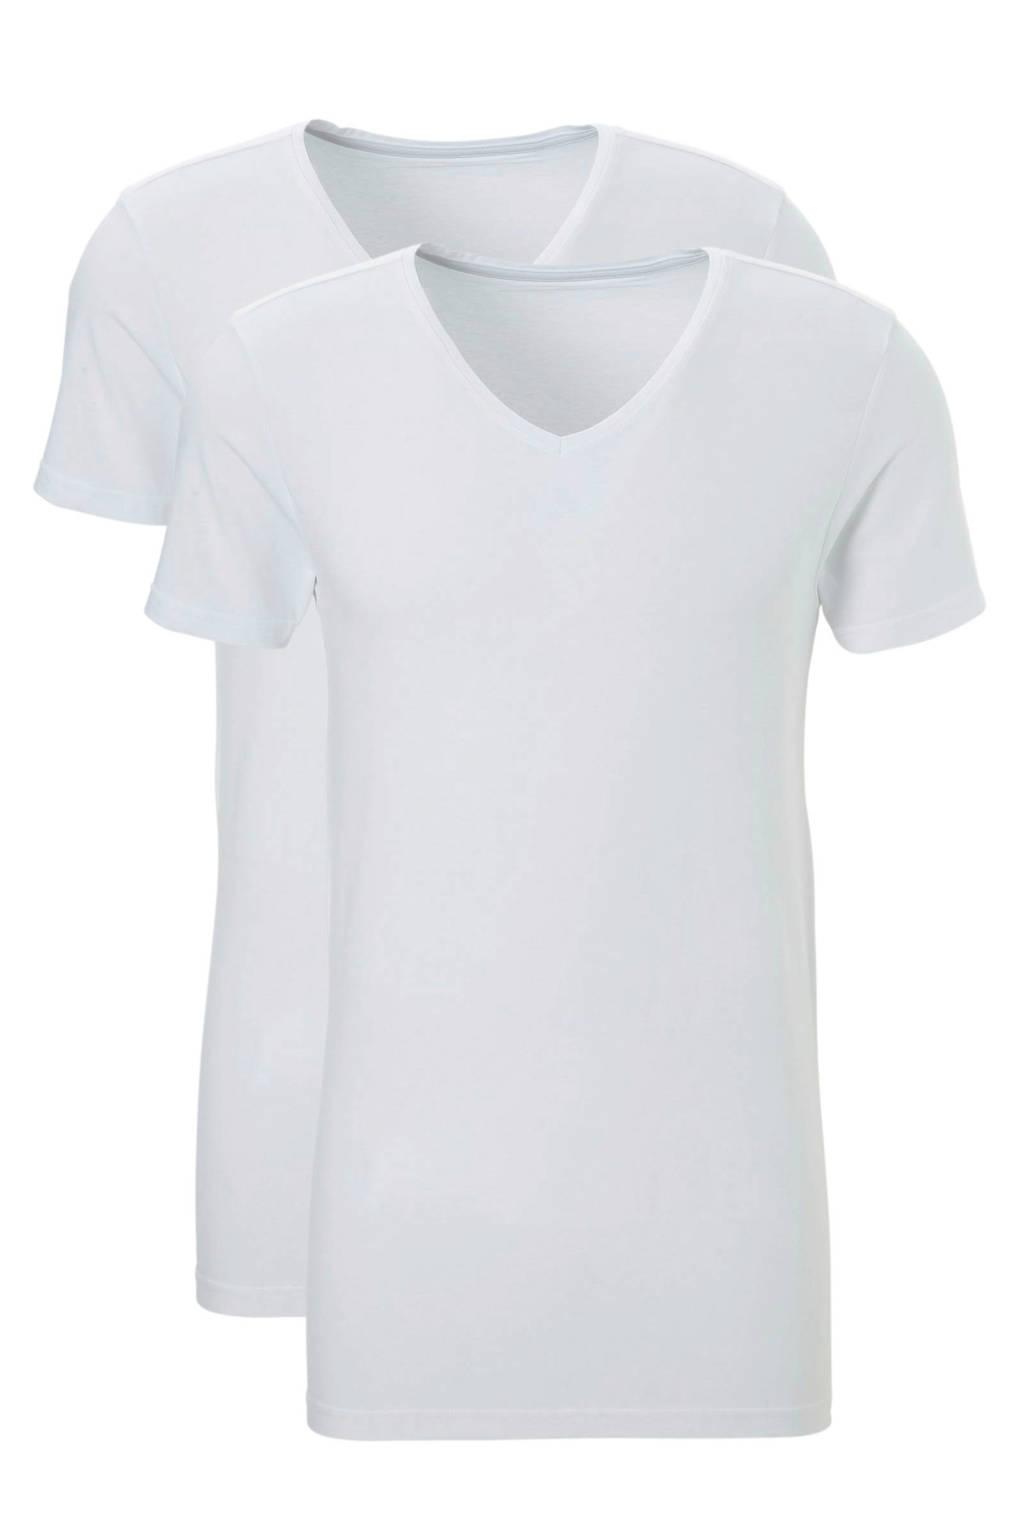 ten Cate slimfit T-shirt (set van 2) wit, Wit